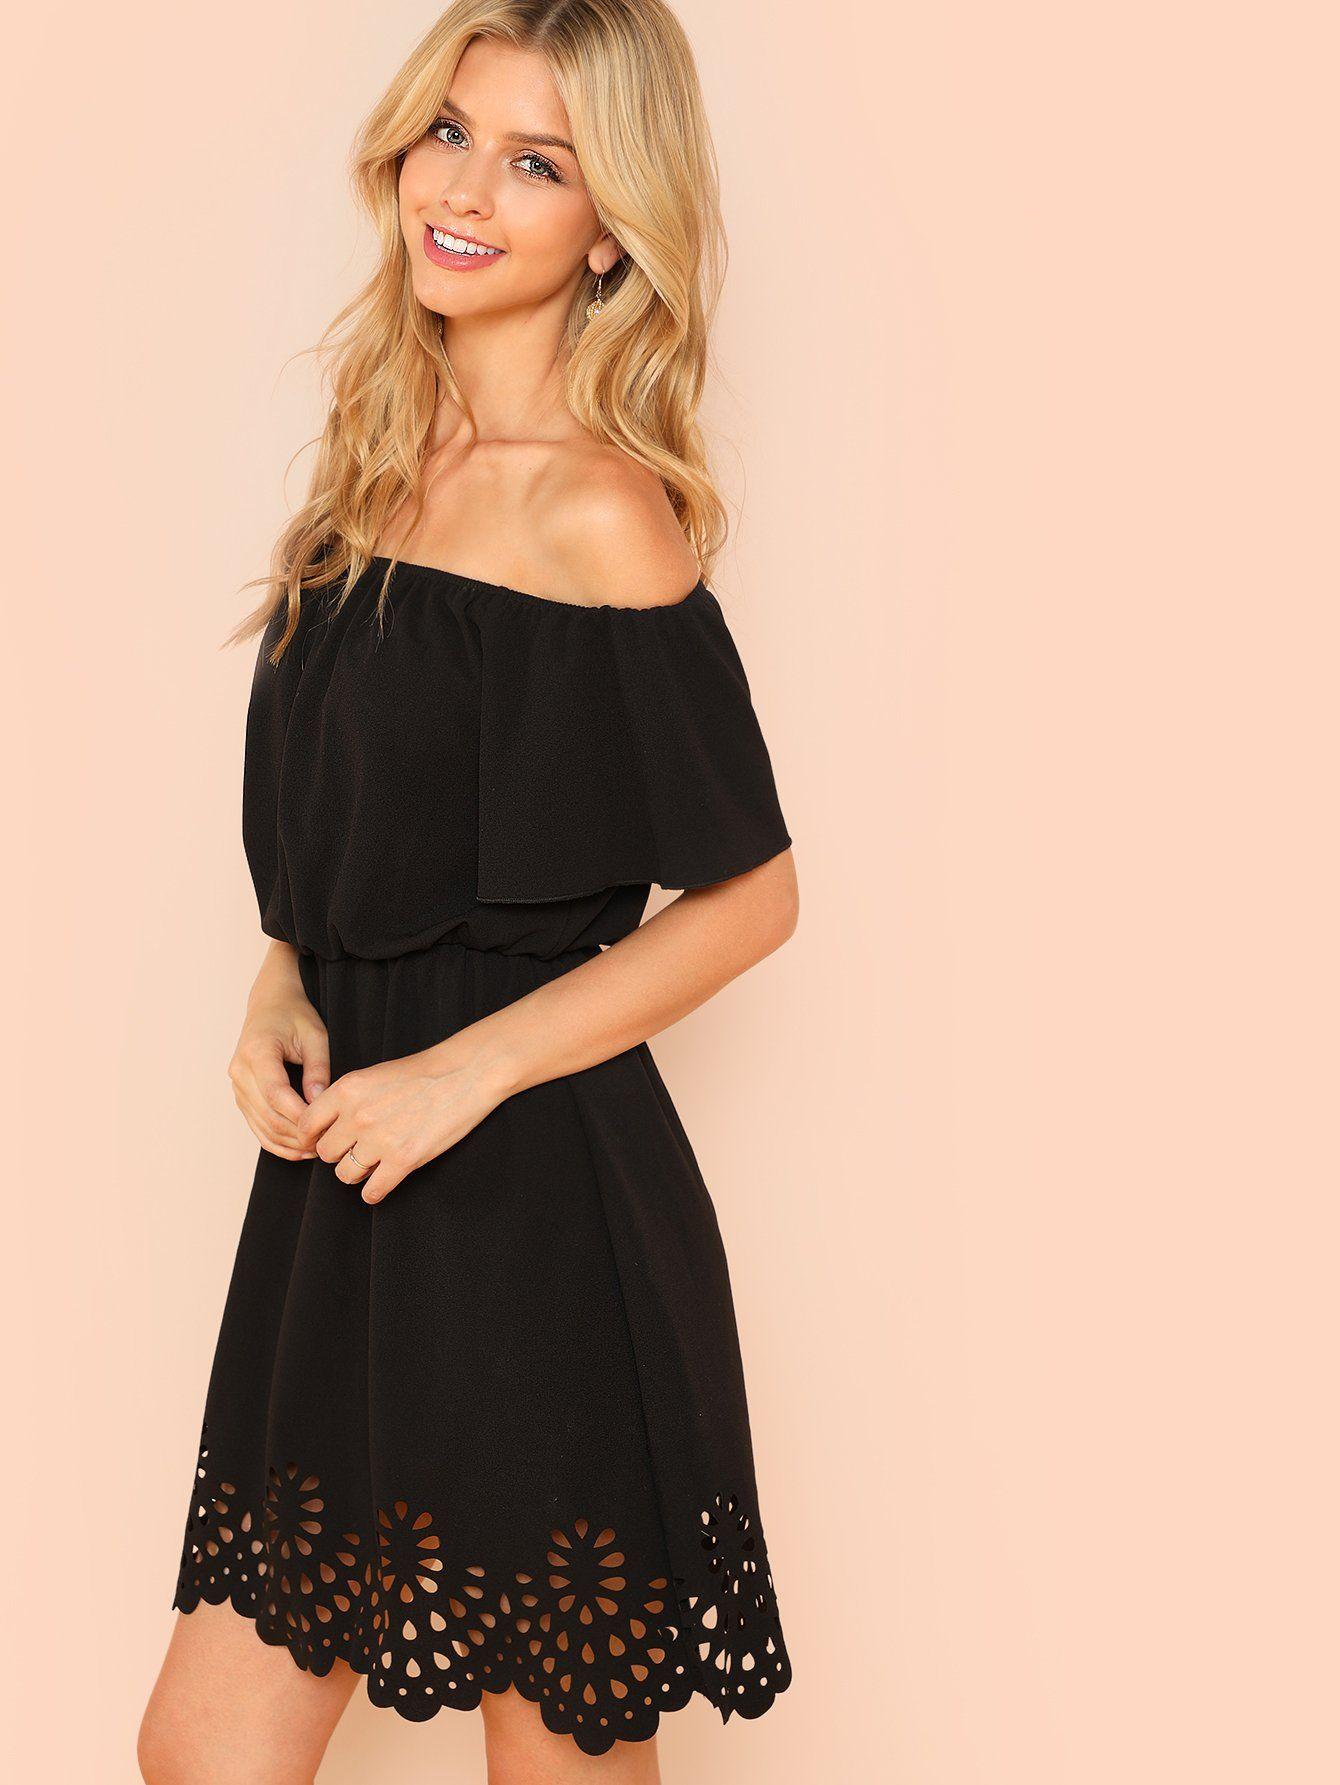 Off Shoulder Cutout Scallop Dress Shein Sheinside Dresses Scalloped Dress Beautiful Fashion [ 1785 x 1340 Pixel ]